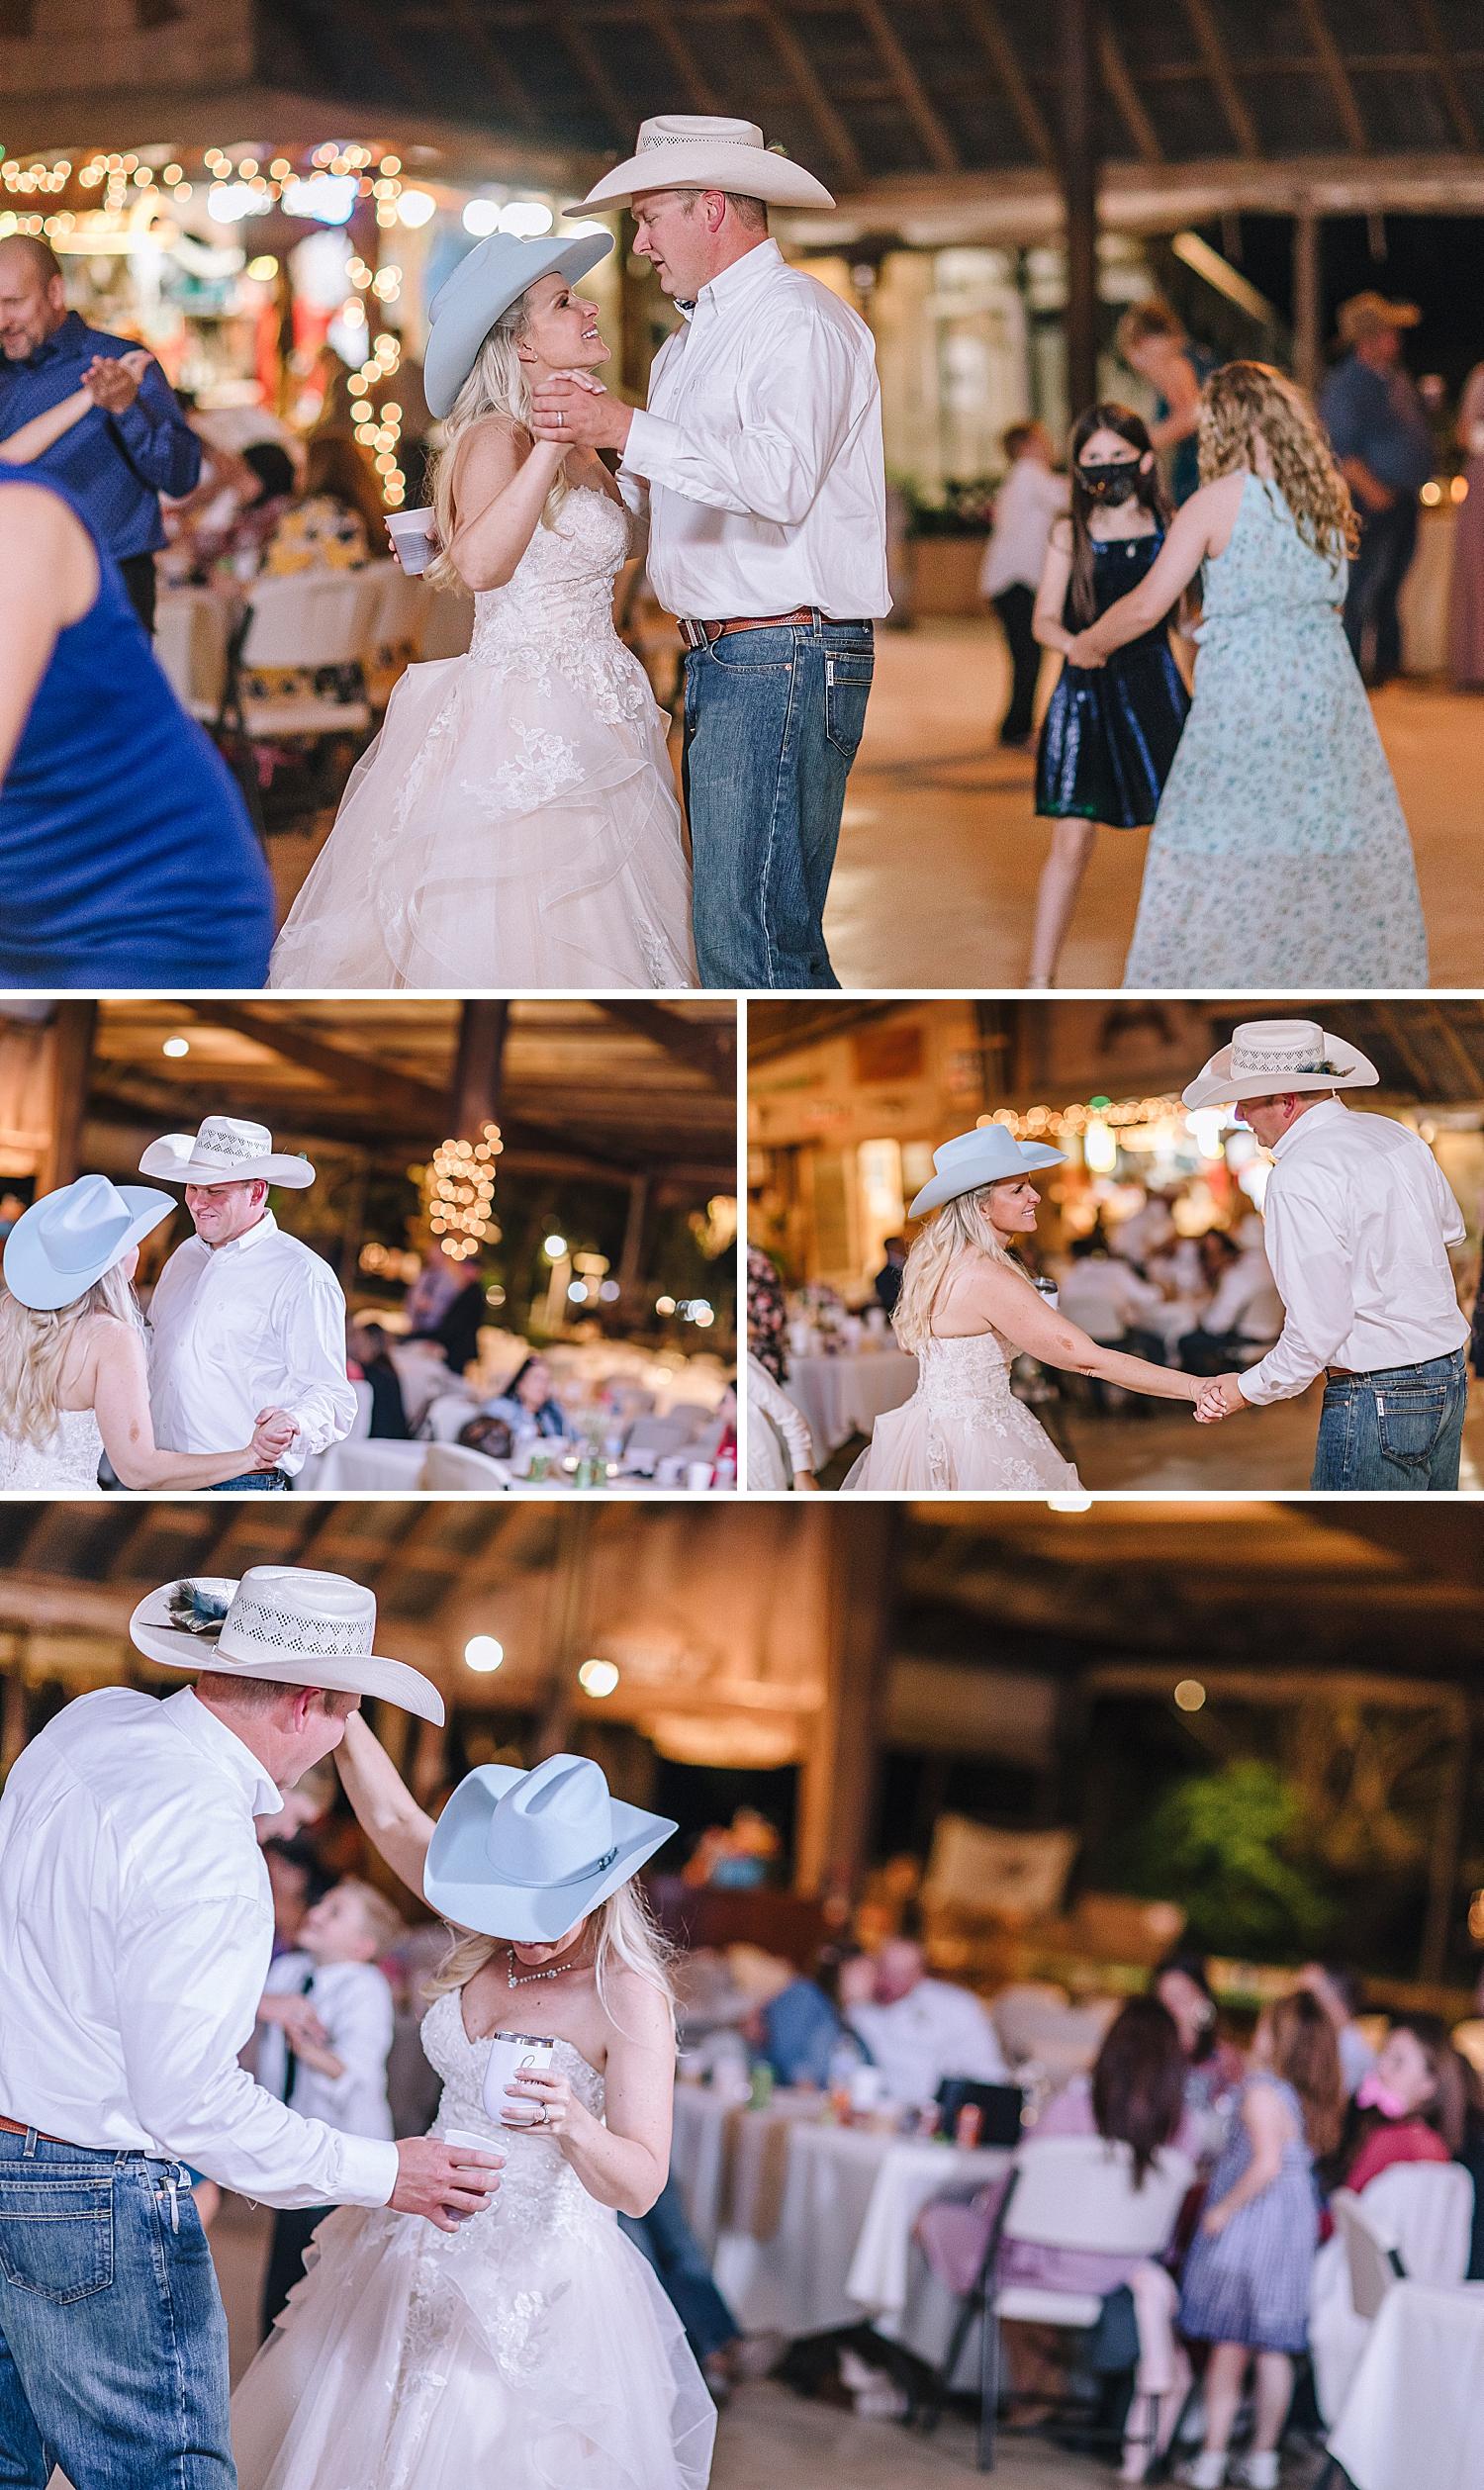 Rio-Cibilo-Ranch-Marion-Texas-Wedding-Rustic-Blush-Rose-Quartz-Details-Carly-Barton-Photography_0102.jpg